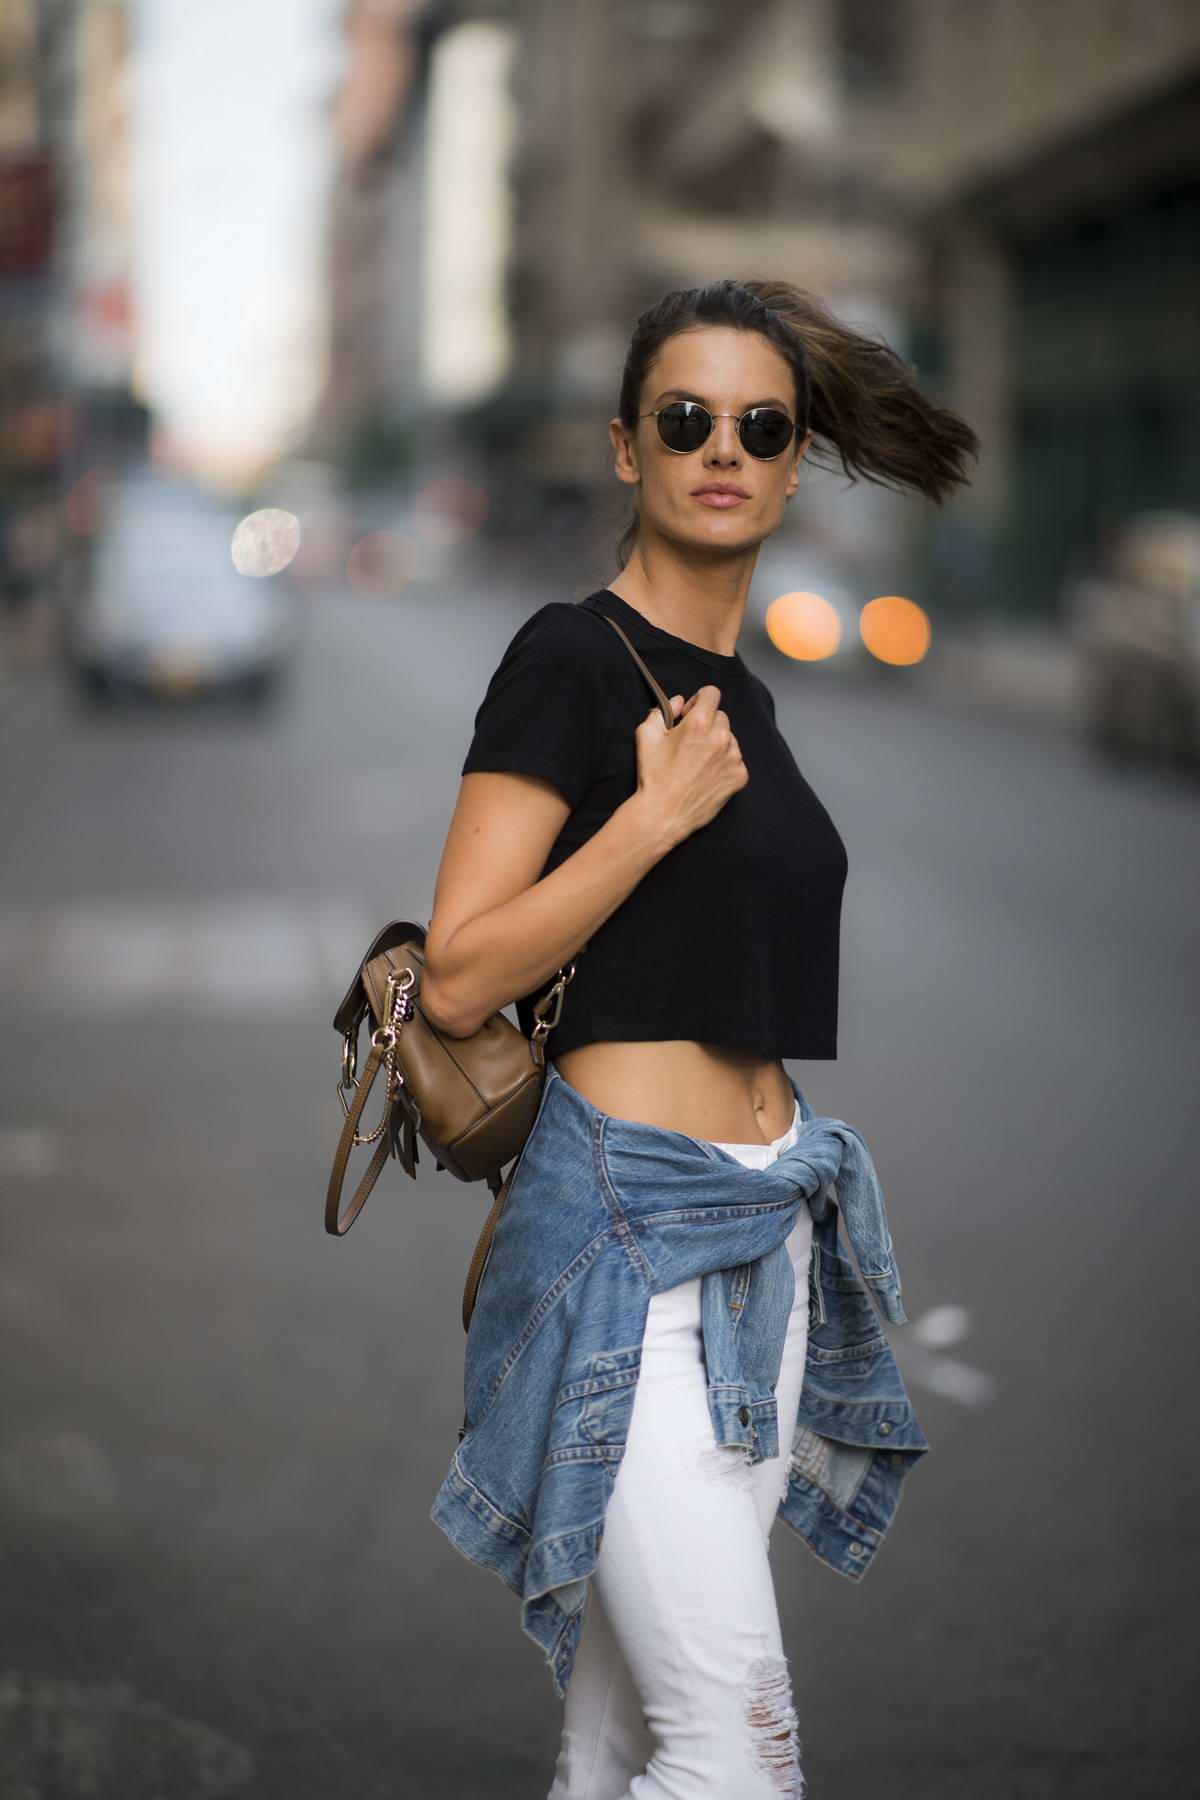 Alessandra Ambrosio spotted running errands in Manhattan, New York